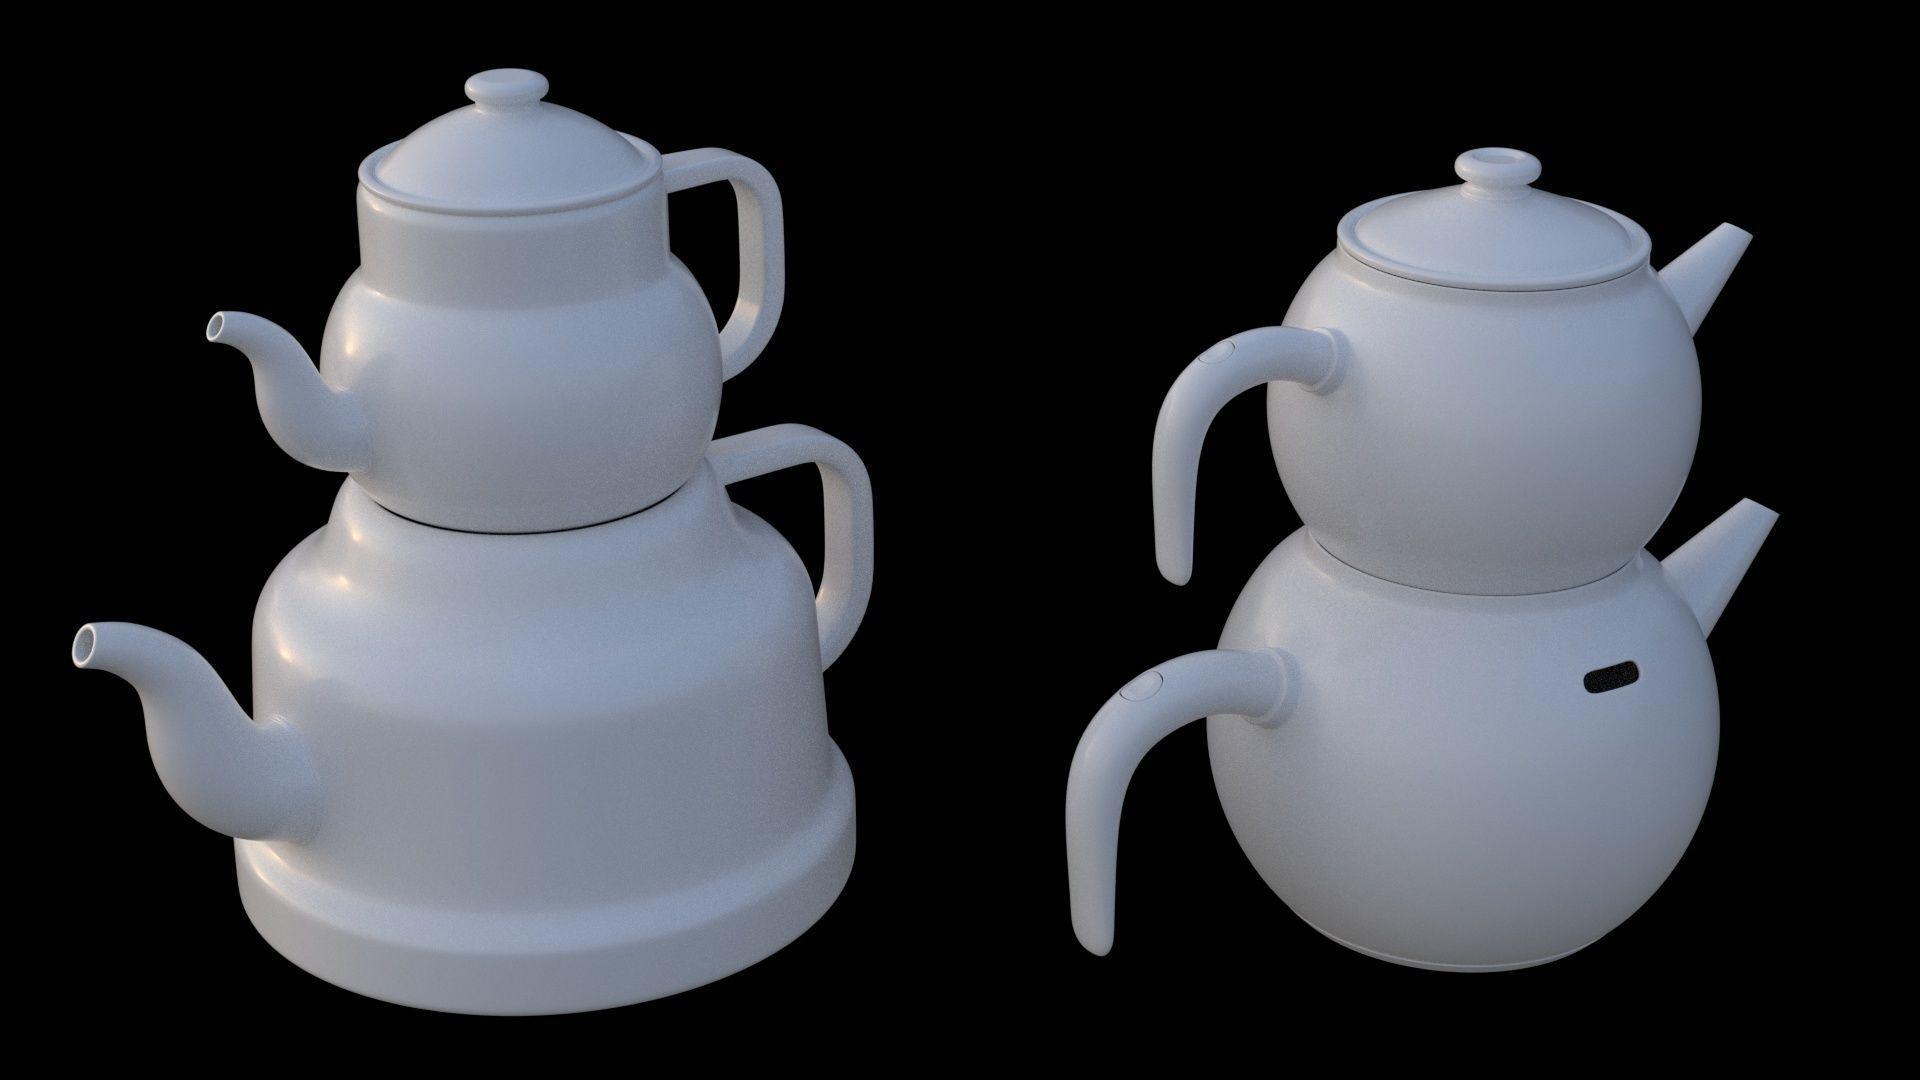 Teapot - 2 Piece